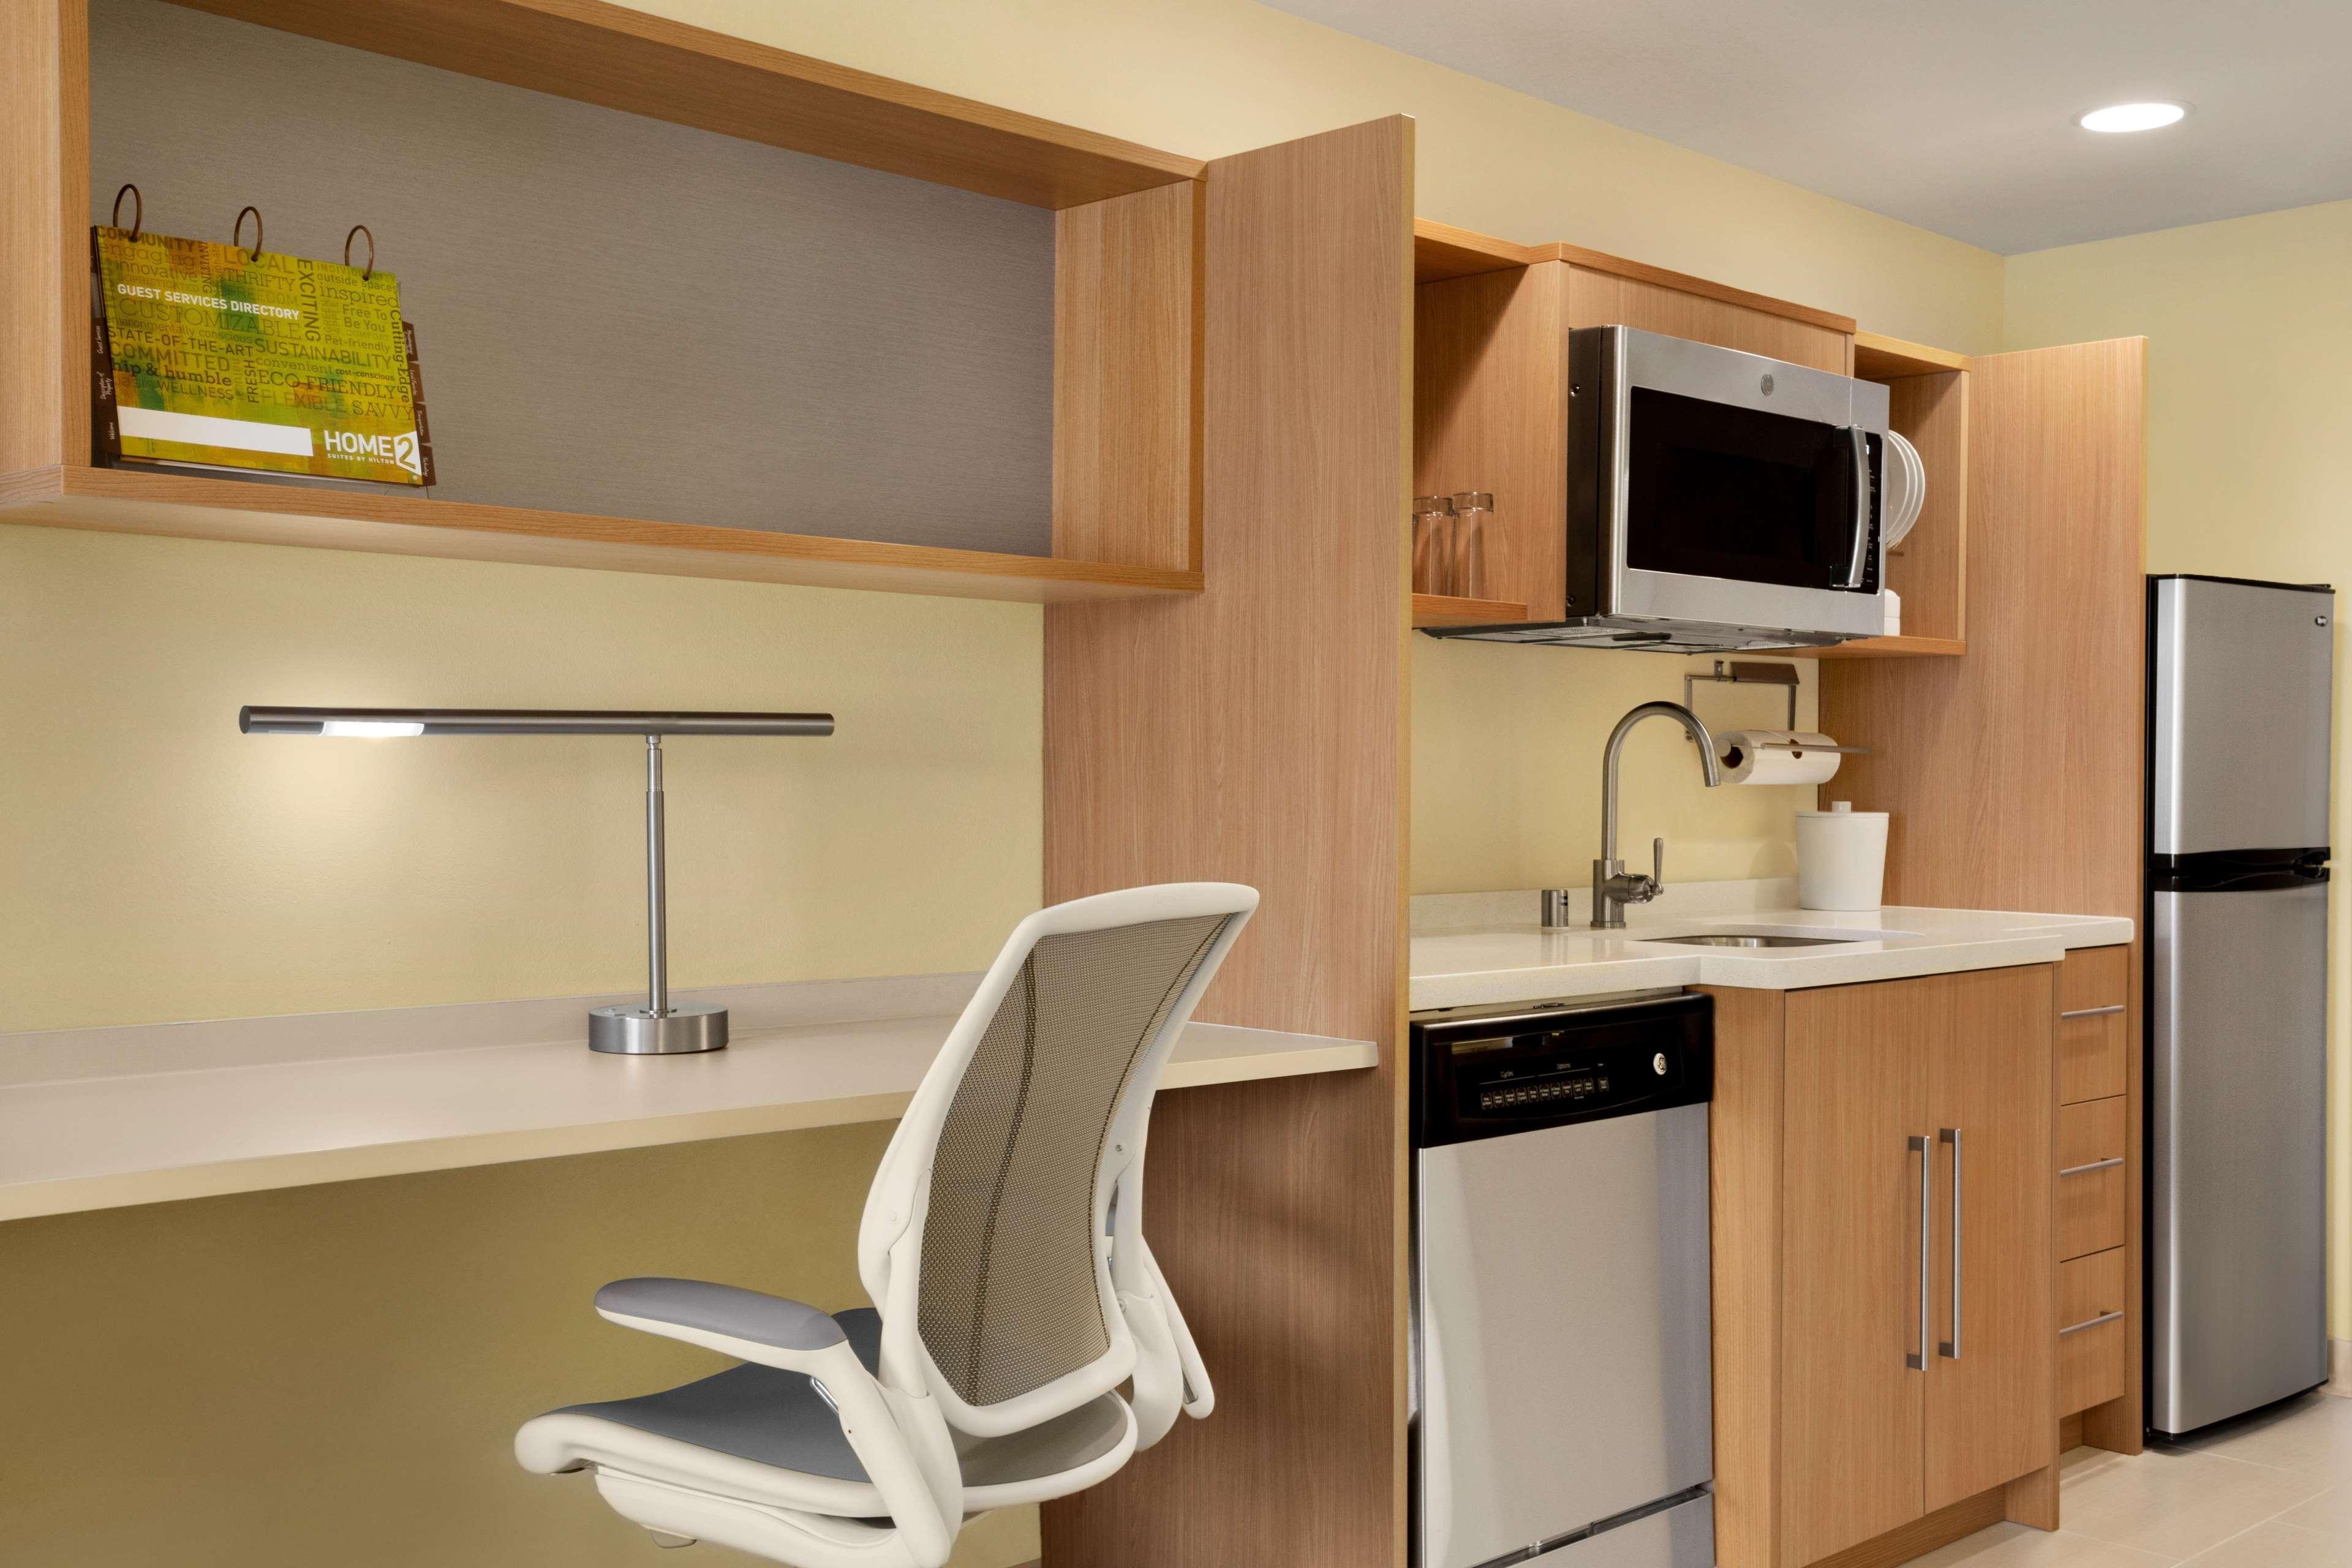 Home2 Suites by Hilton Elko image 20